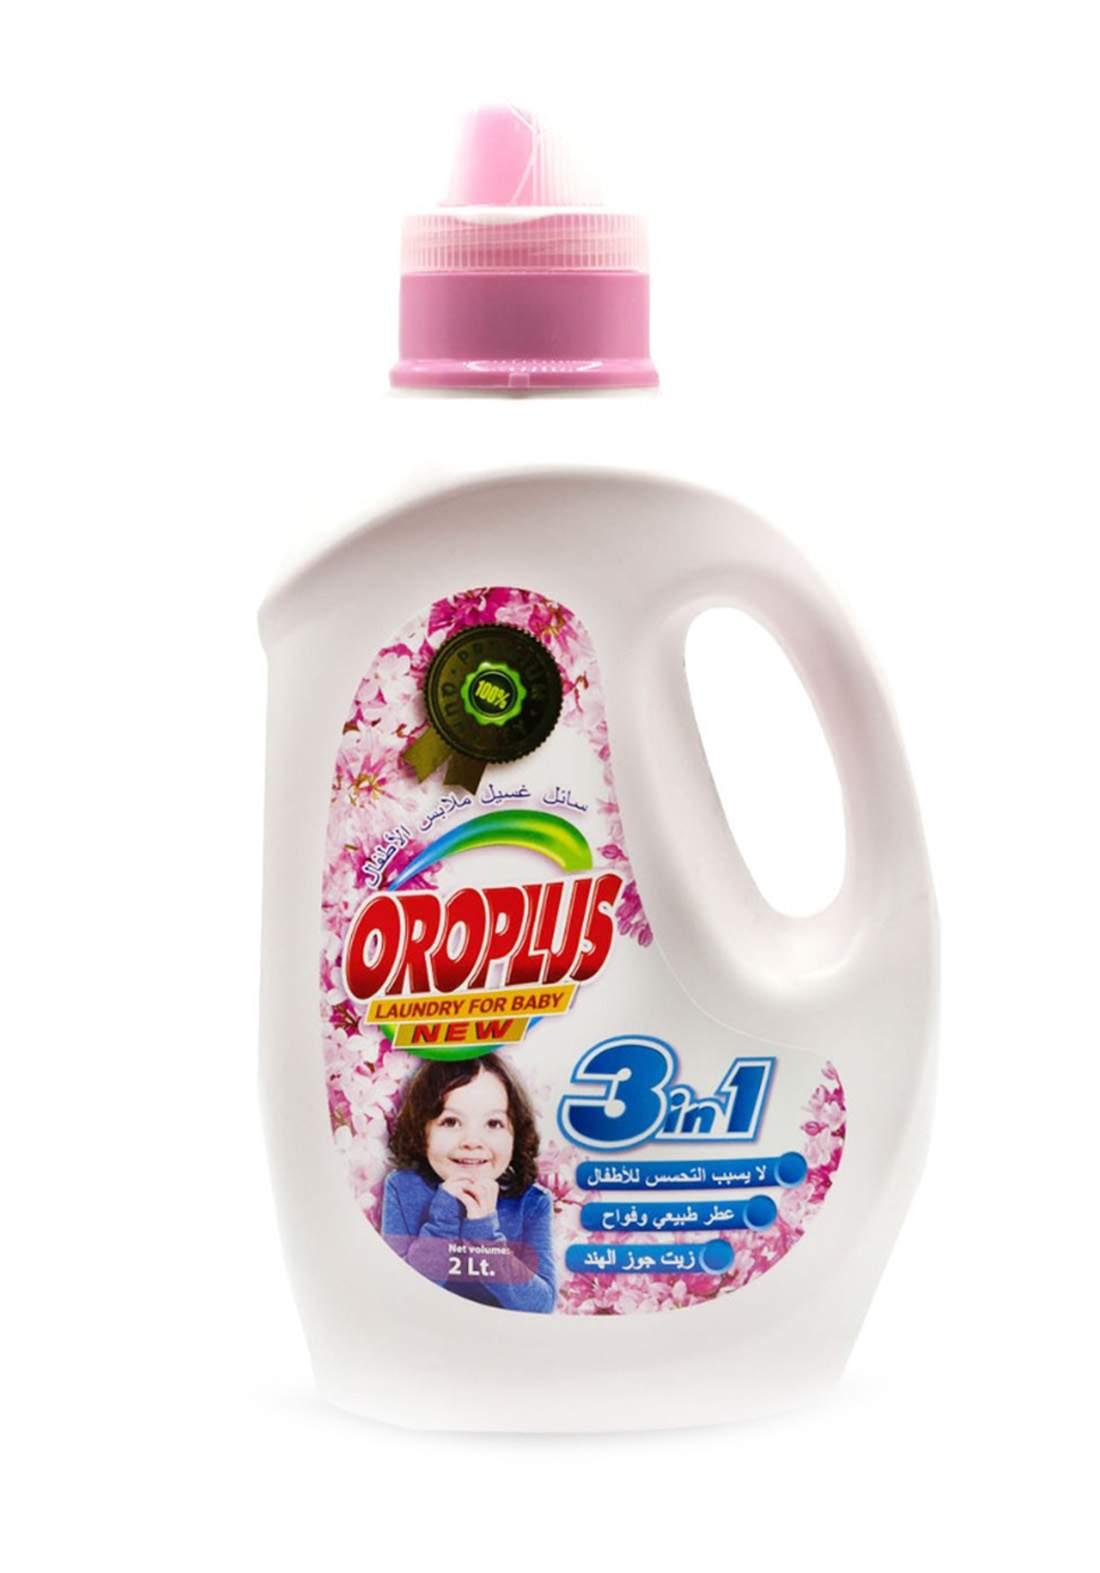 Oroplus  laundry for   Baby  سائل غسيل ملابس الأطفال 2 لتر